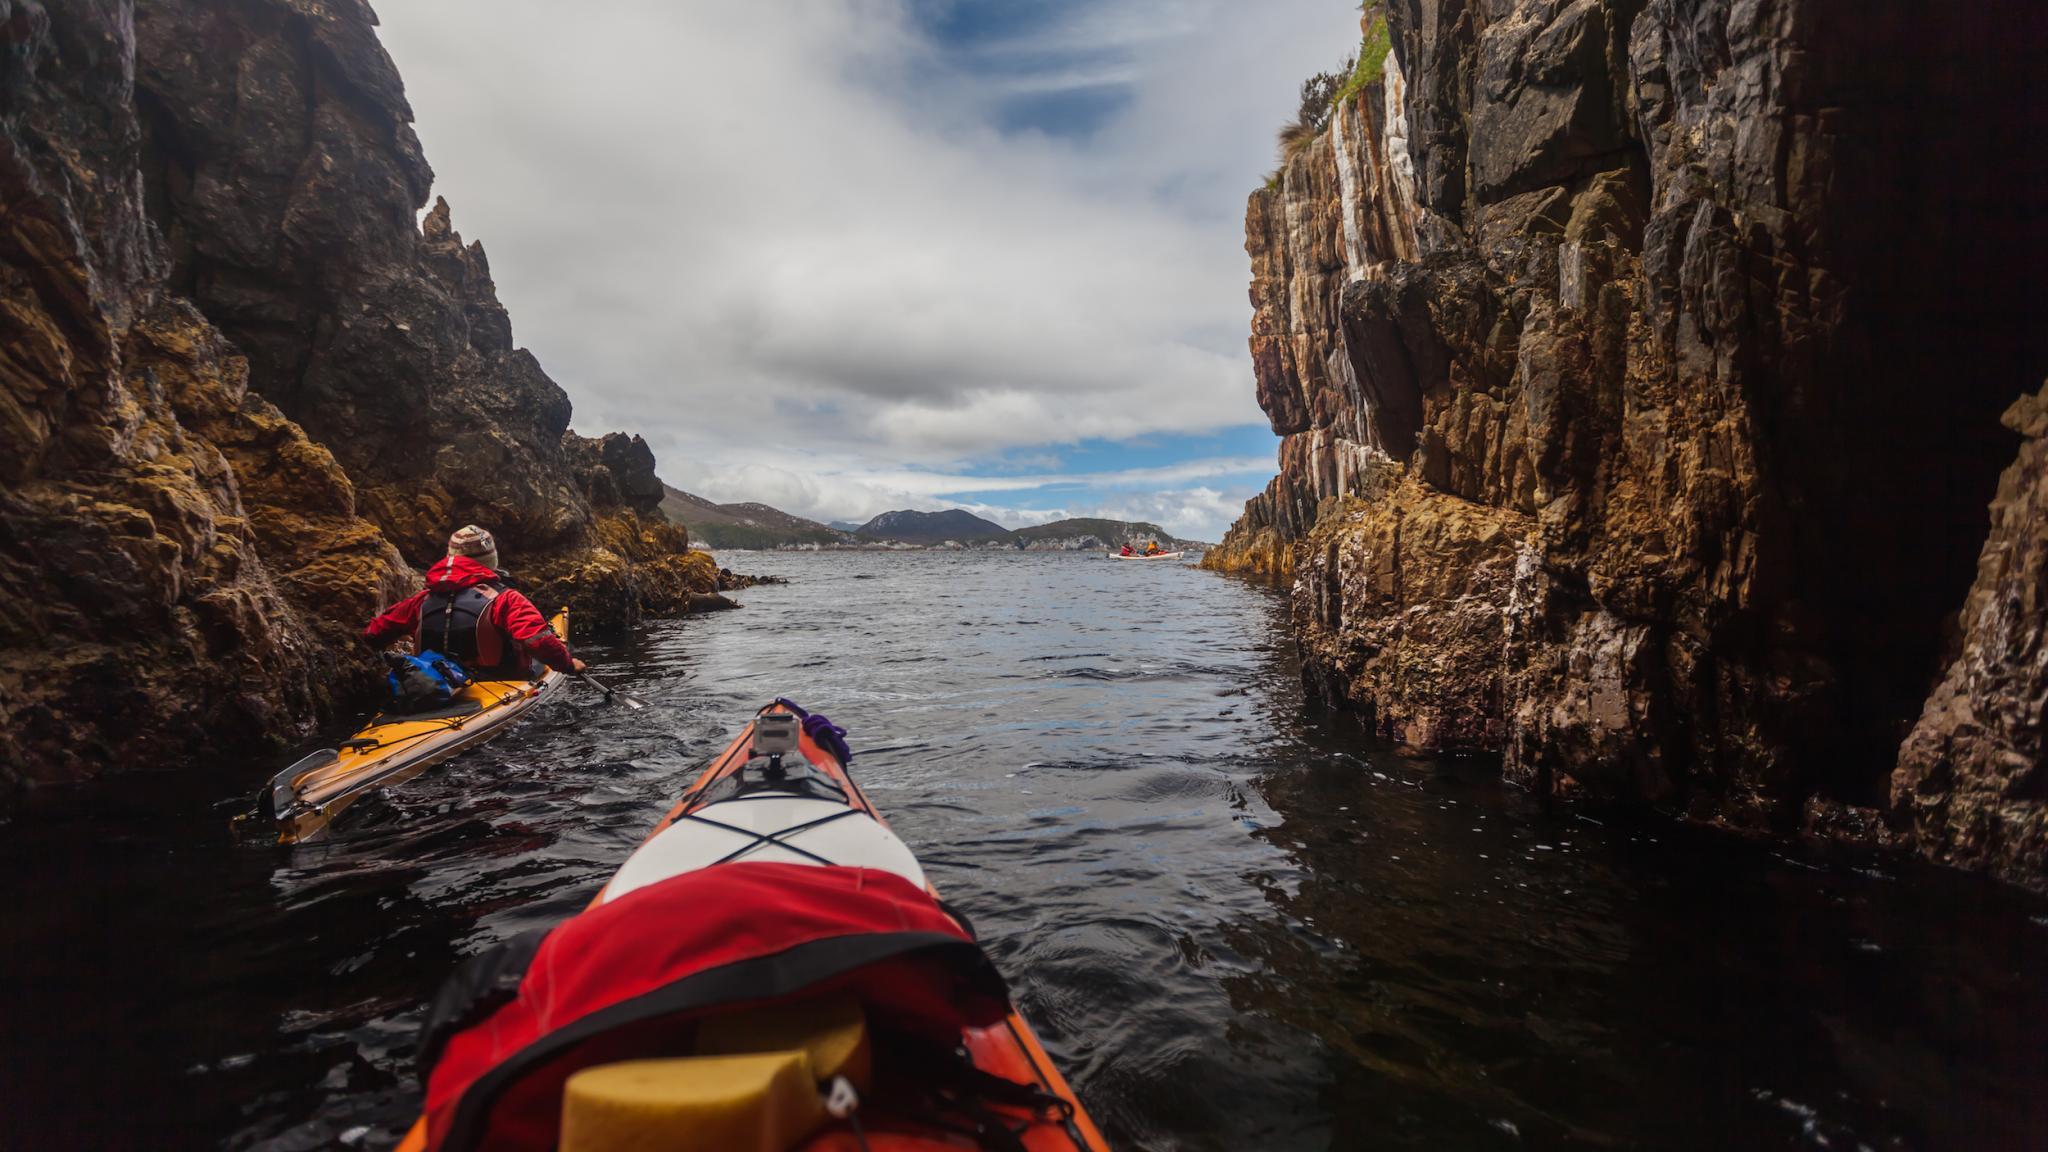 Roaring 40s Kayaking - Kayaking adventures around Breaksea Island, Southwest Tasmania